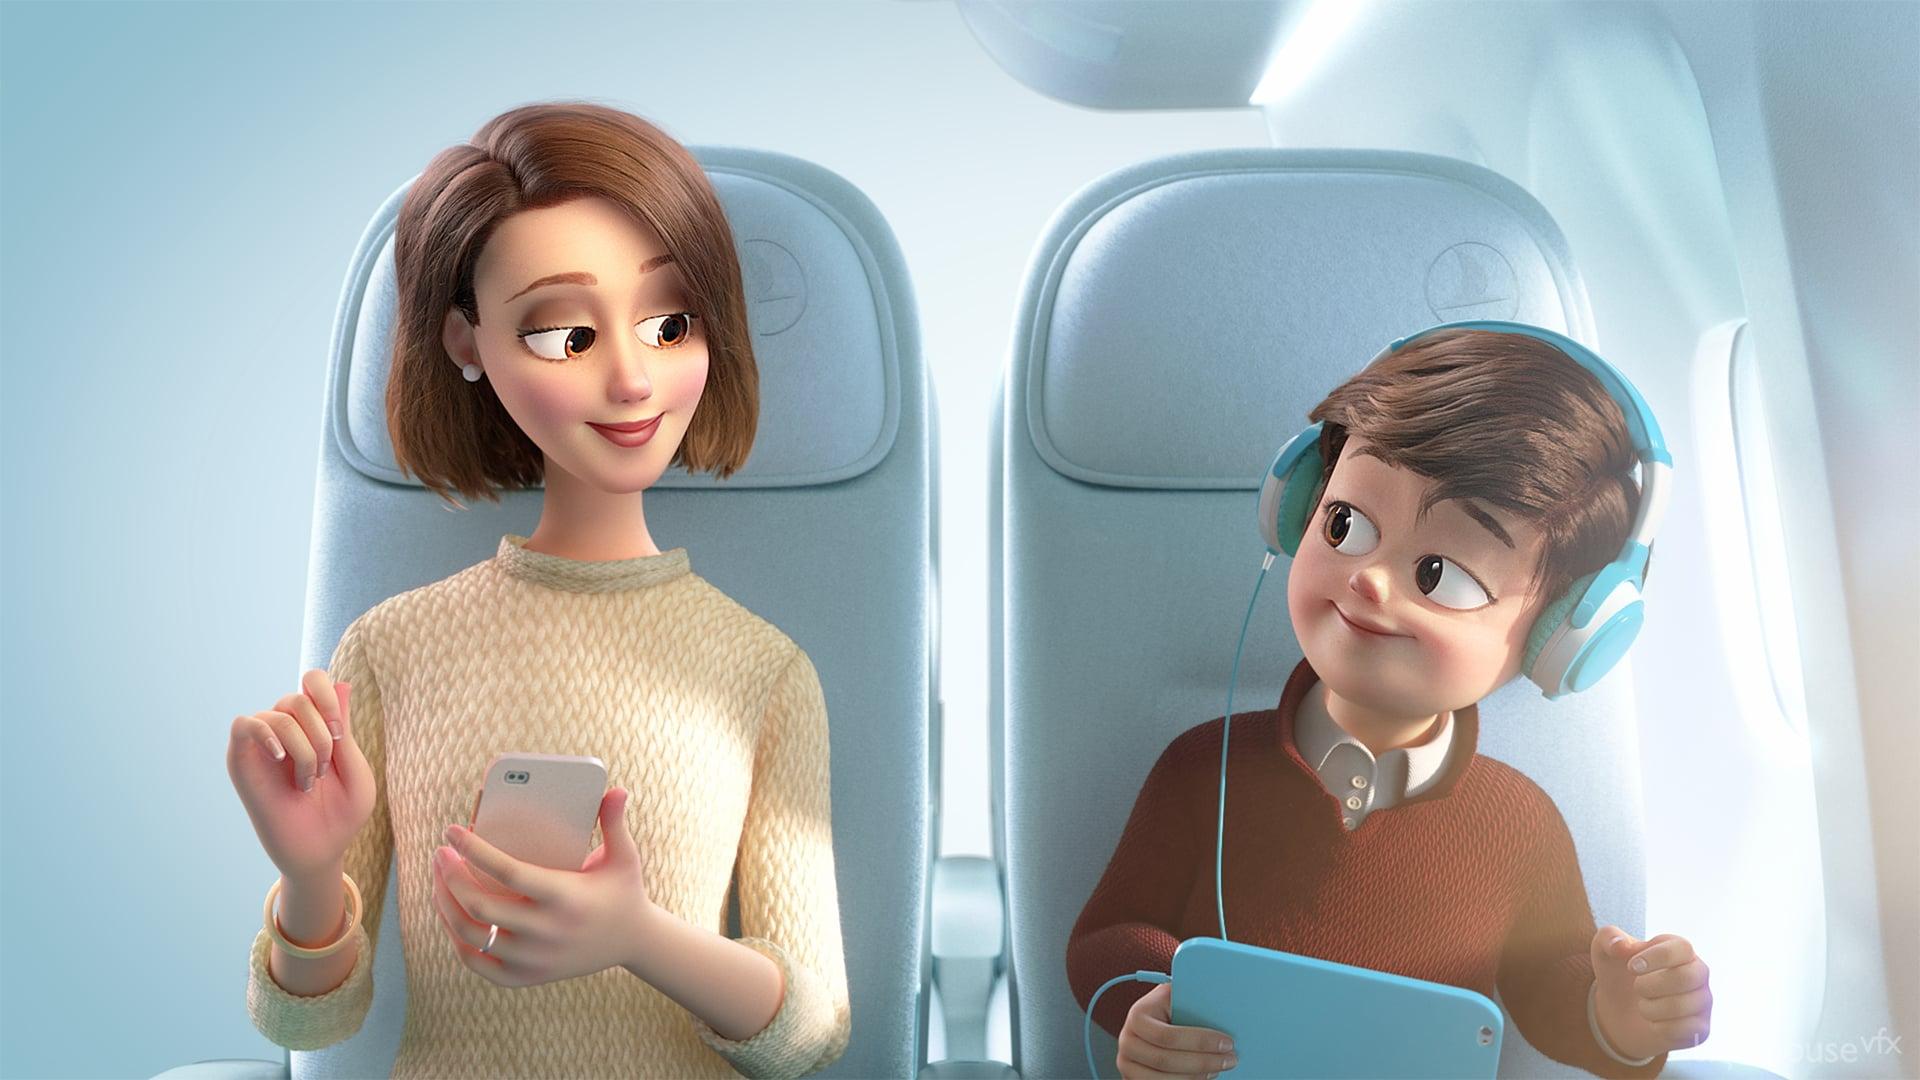 Turkish Airlines In-flight Safety Video